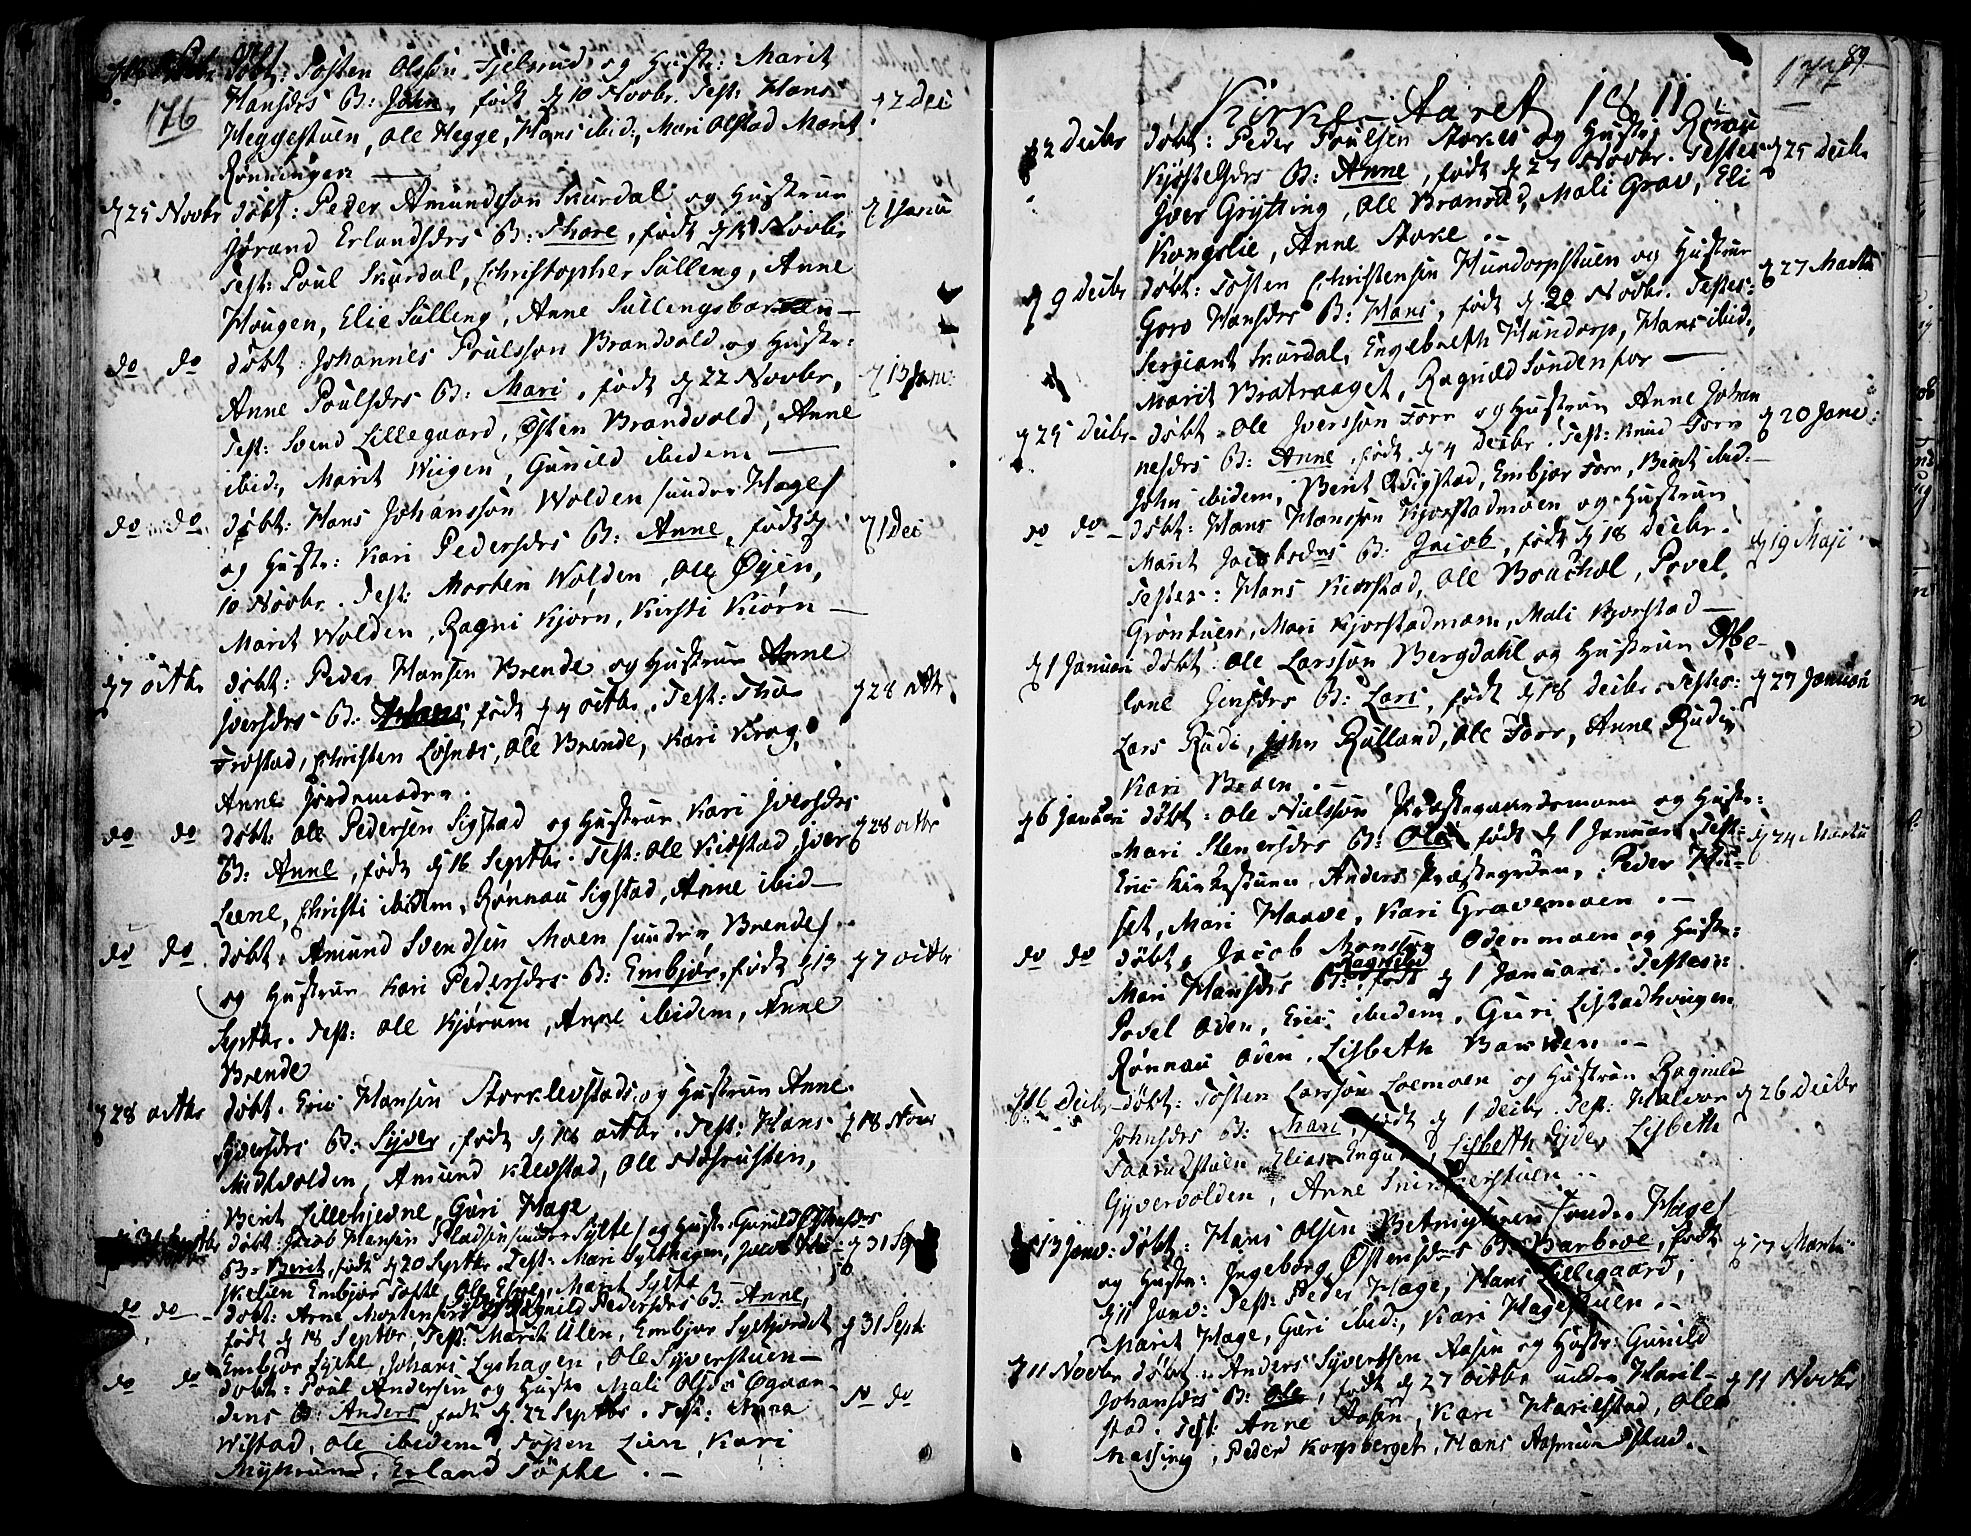 SAH, Fron prestekontor, H/Ha/Haa/L0001: Ministerialbok nr. 1, 1799-1816, s. 176-177